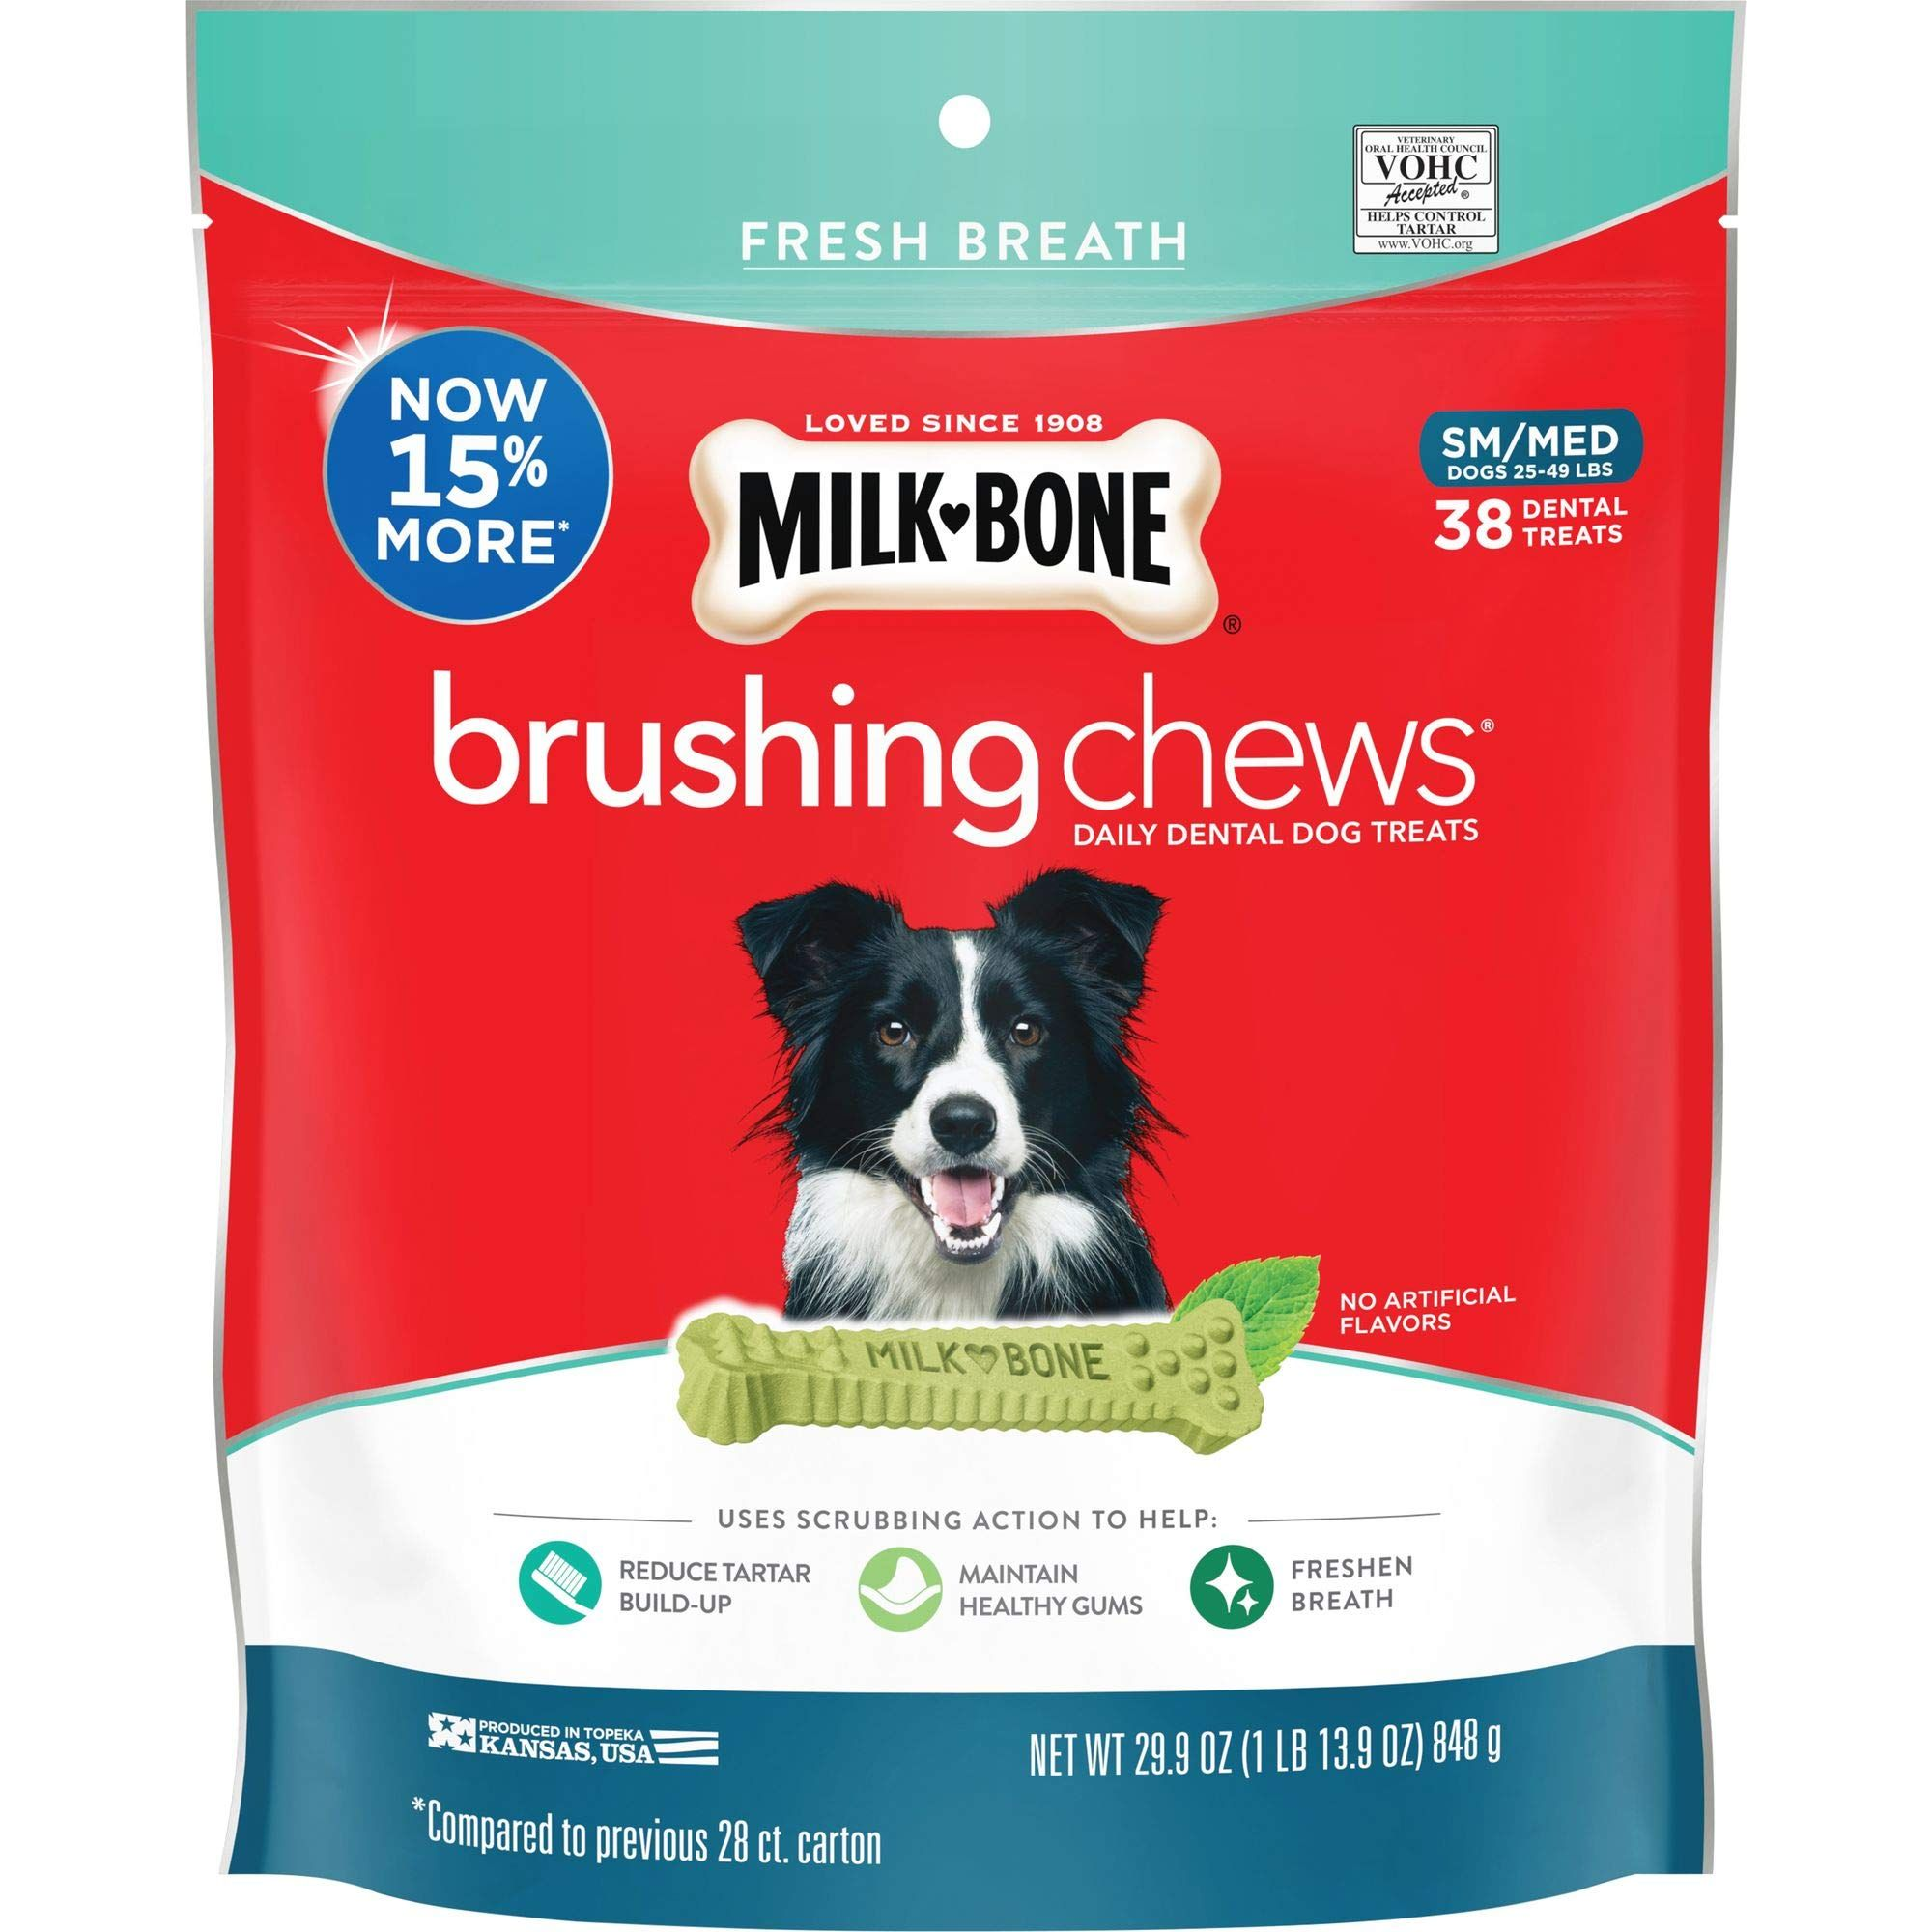 Milk Bone Brushing Chews Daily Dental Dog Treats Want To Know